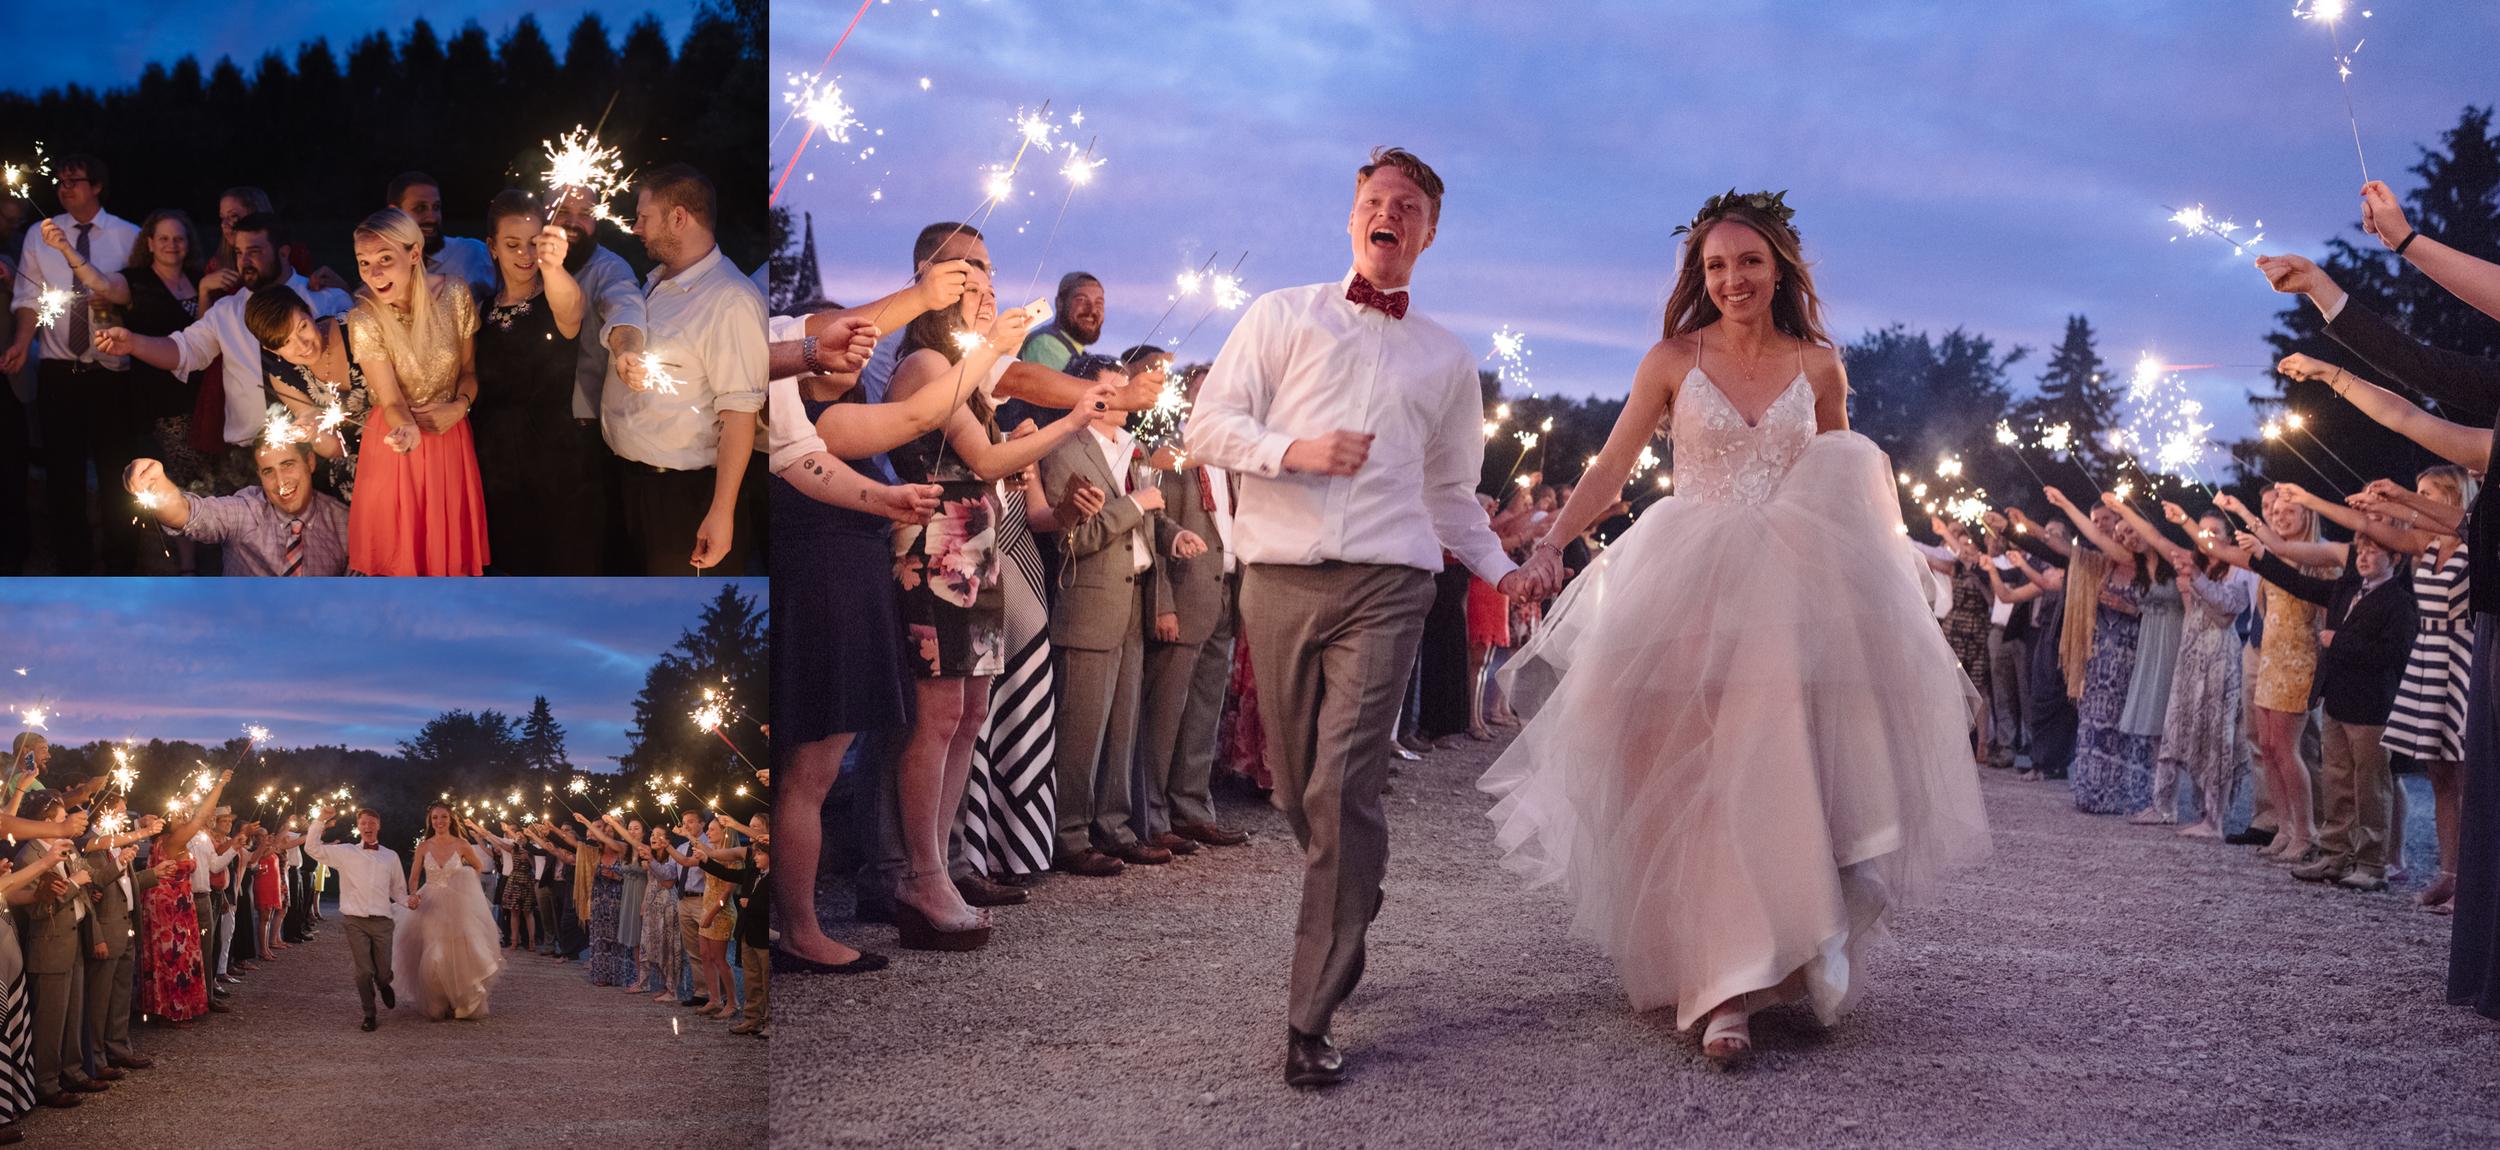 sparklers lingrow farm wedding.jpg